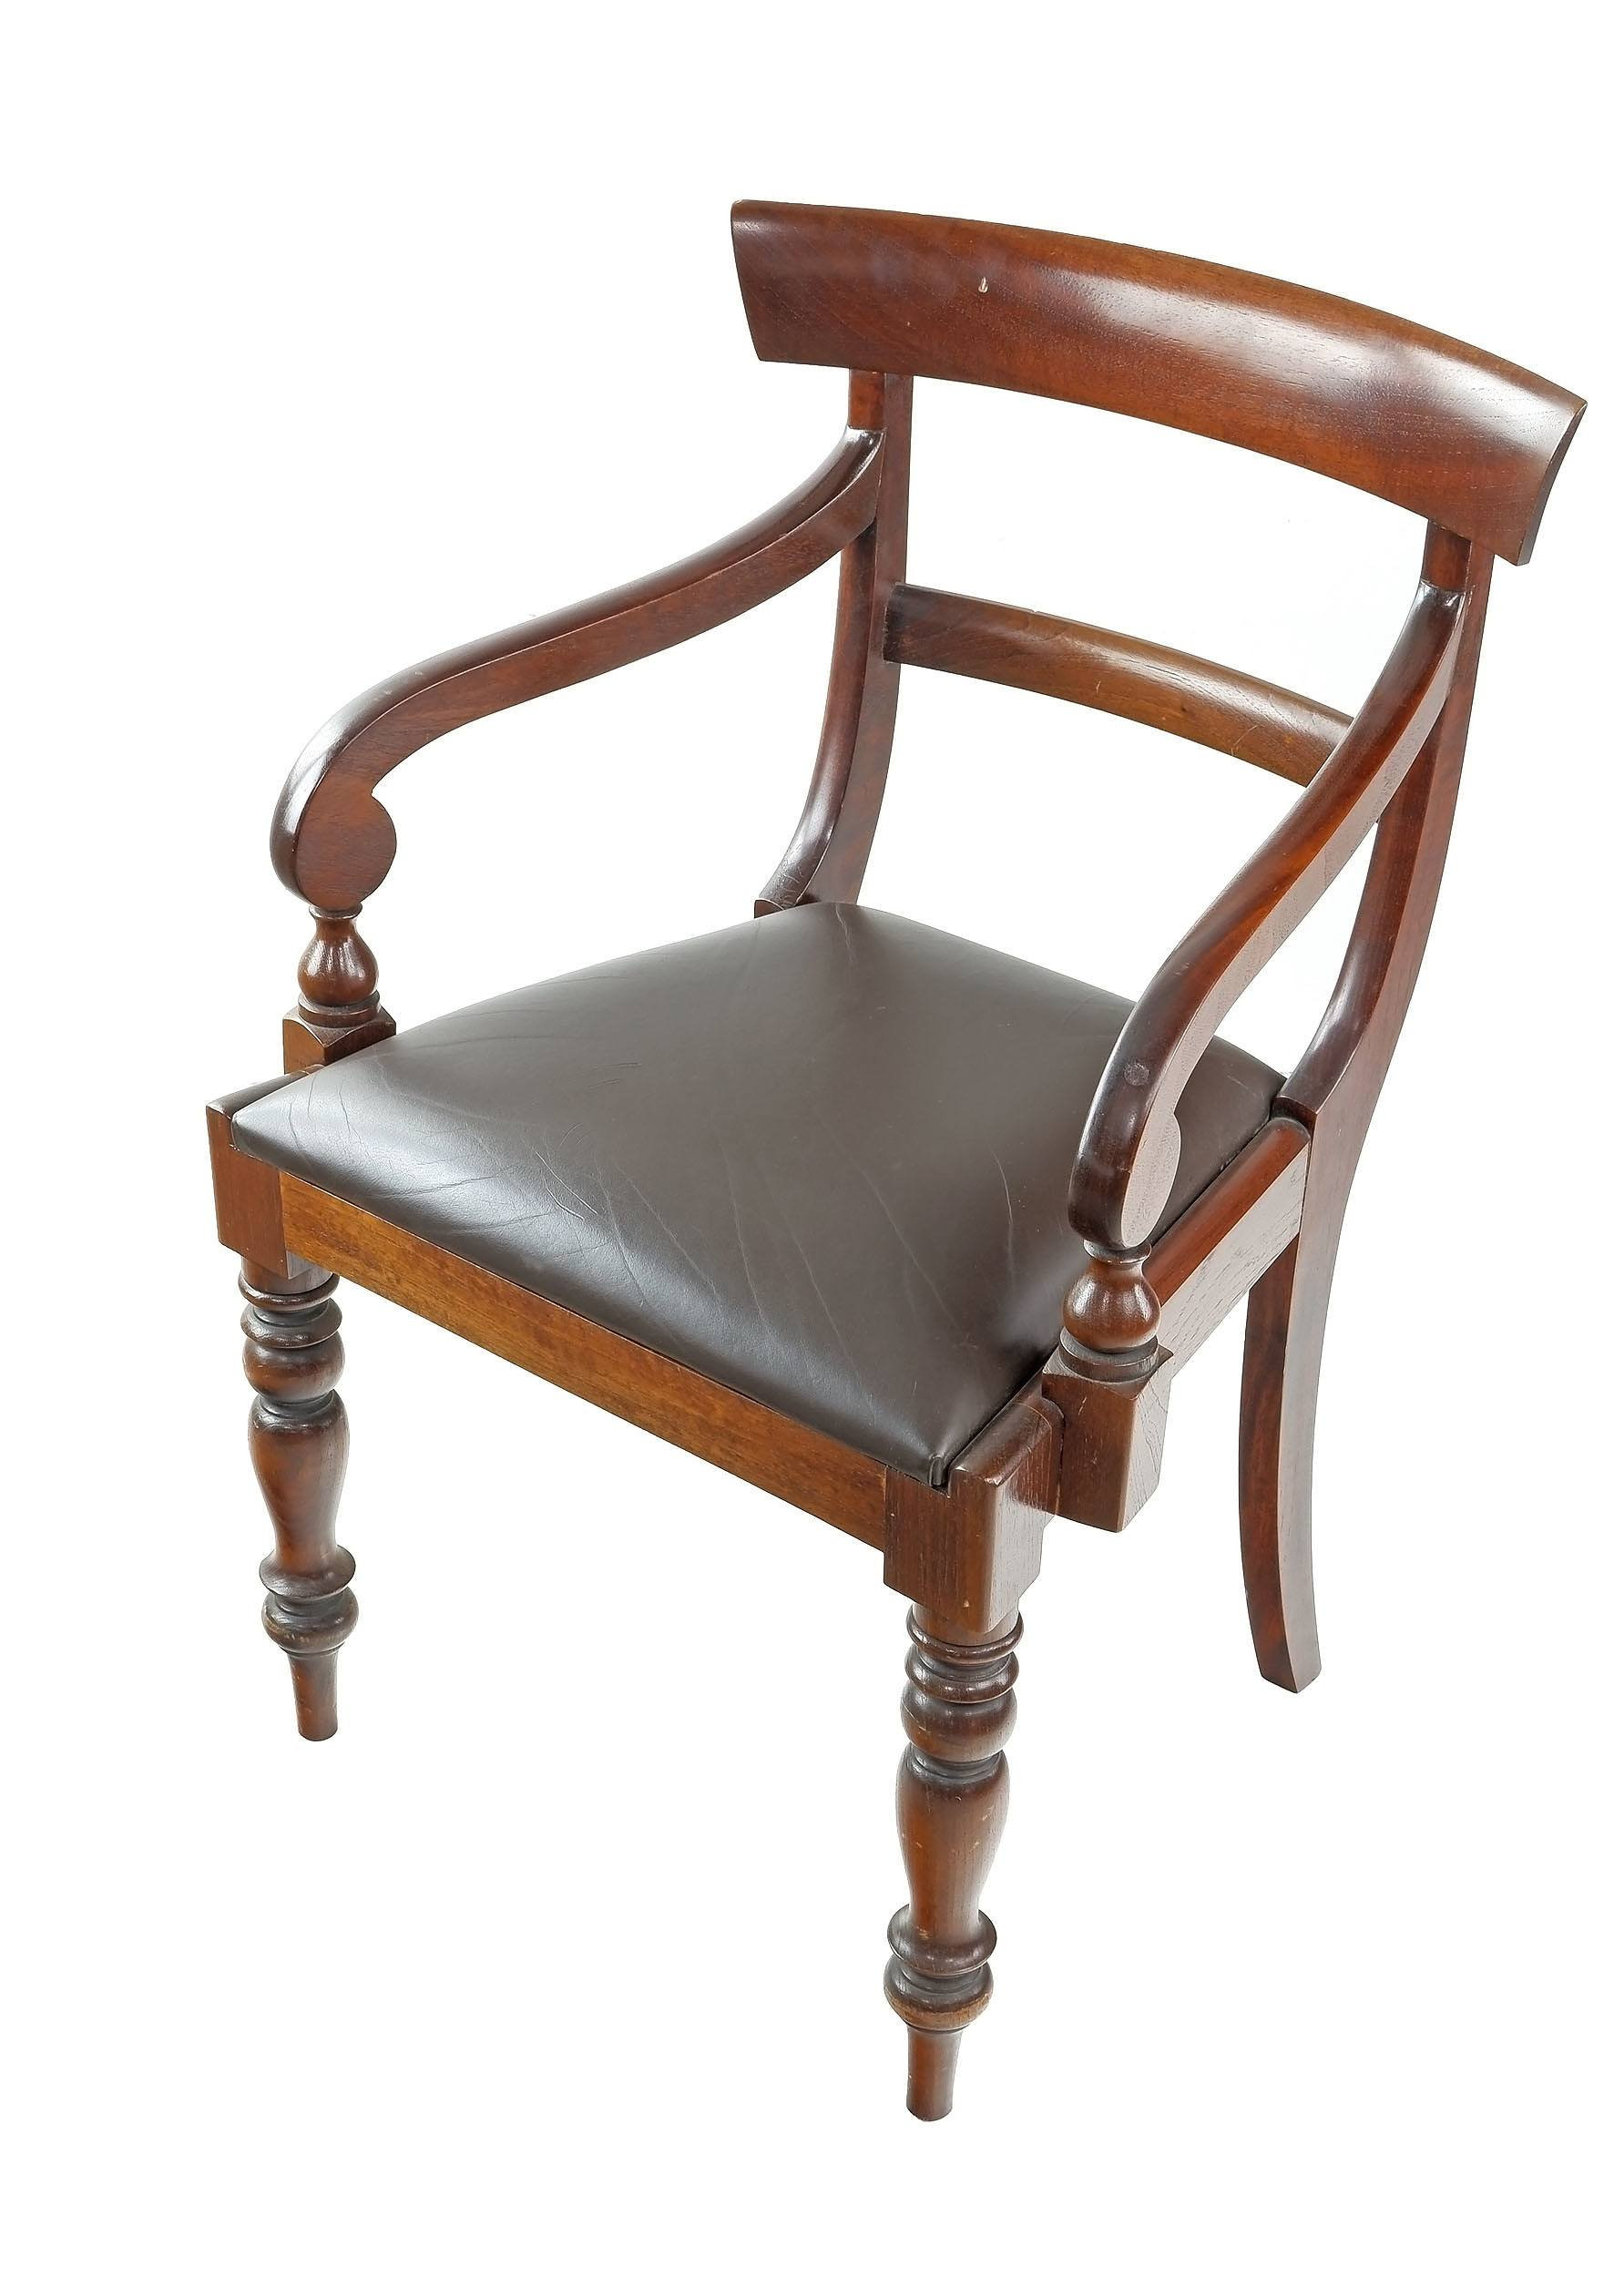 'Antique Australian Cedar Carver Chair'